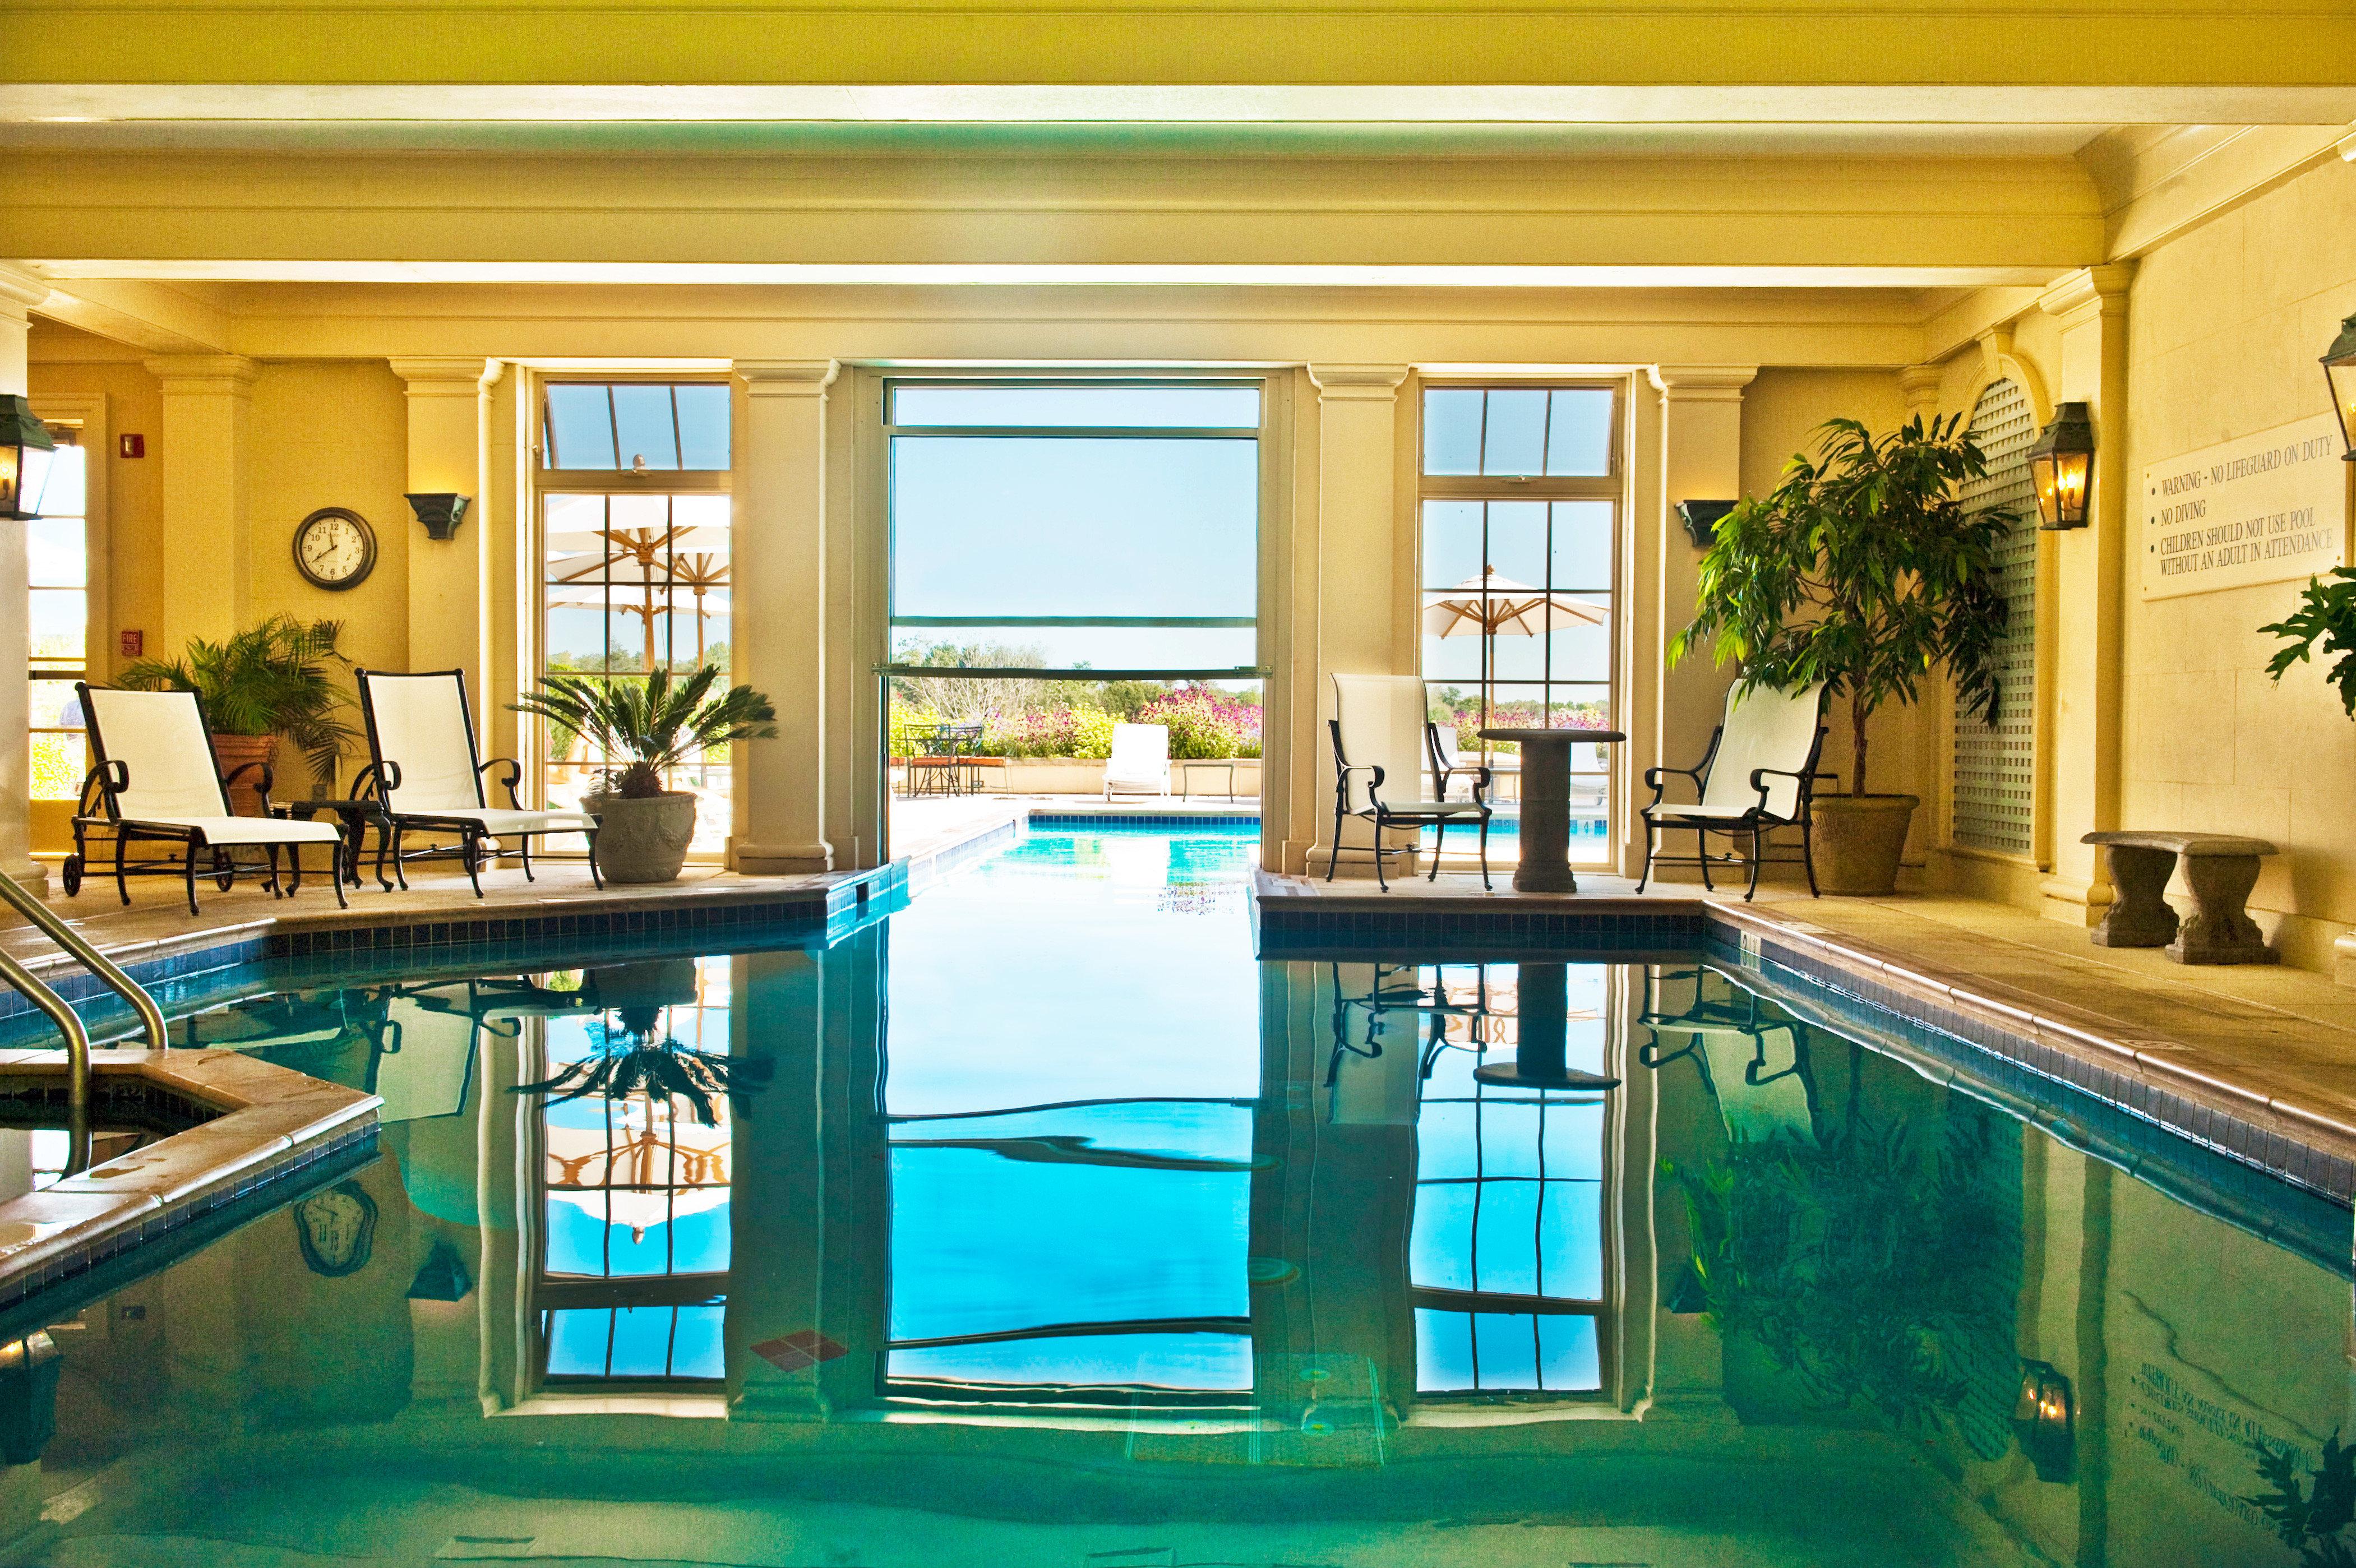 Country Pool Romantic swimming pool property Resort leisure condominium Villa home mansion